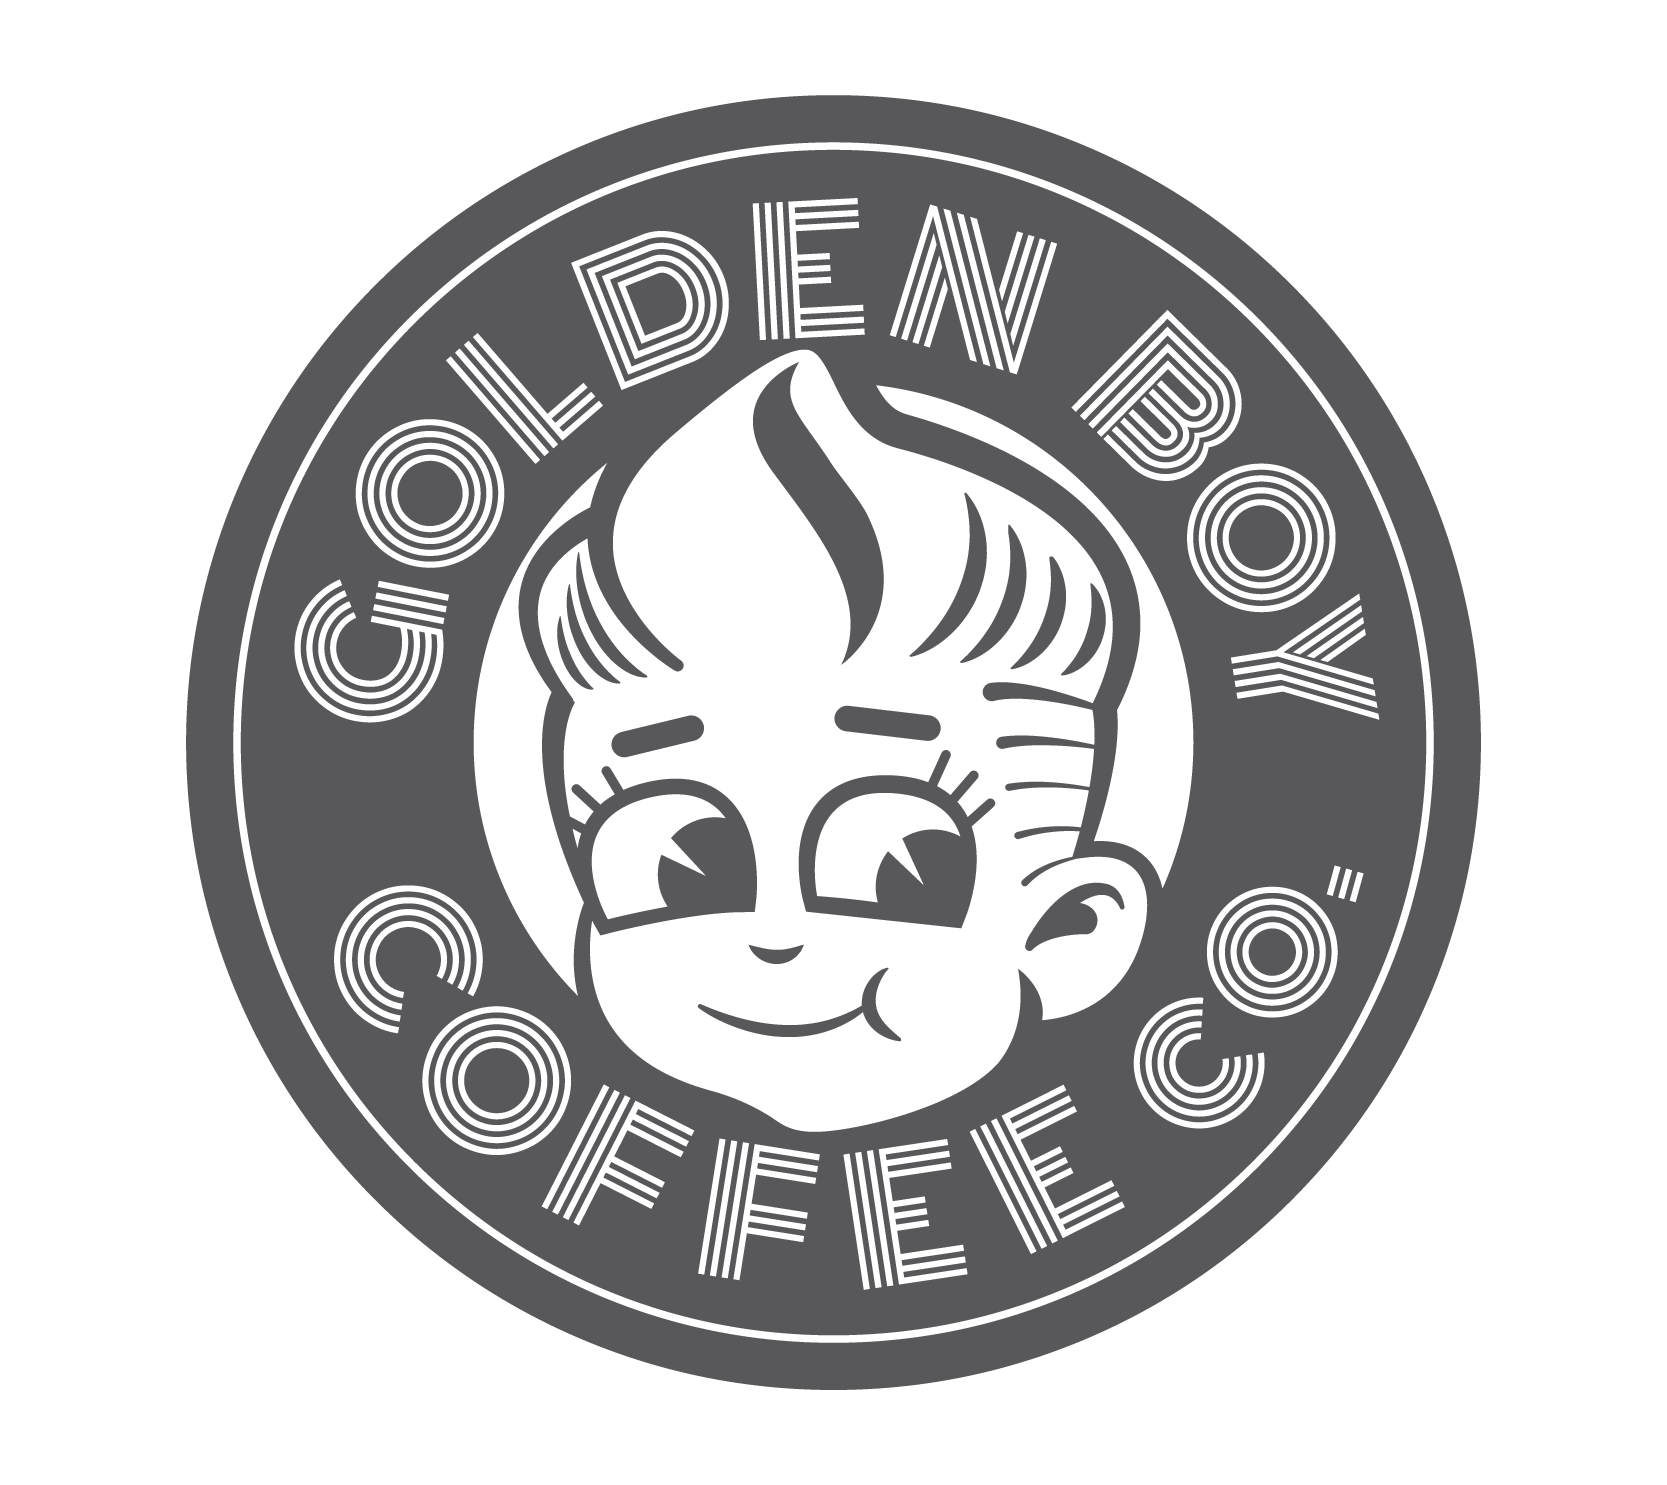 Logos_Golden Boy_Inverse.png